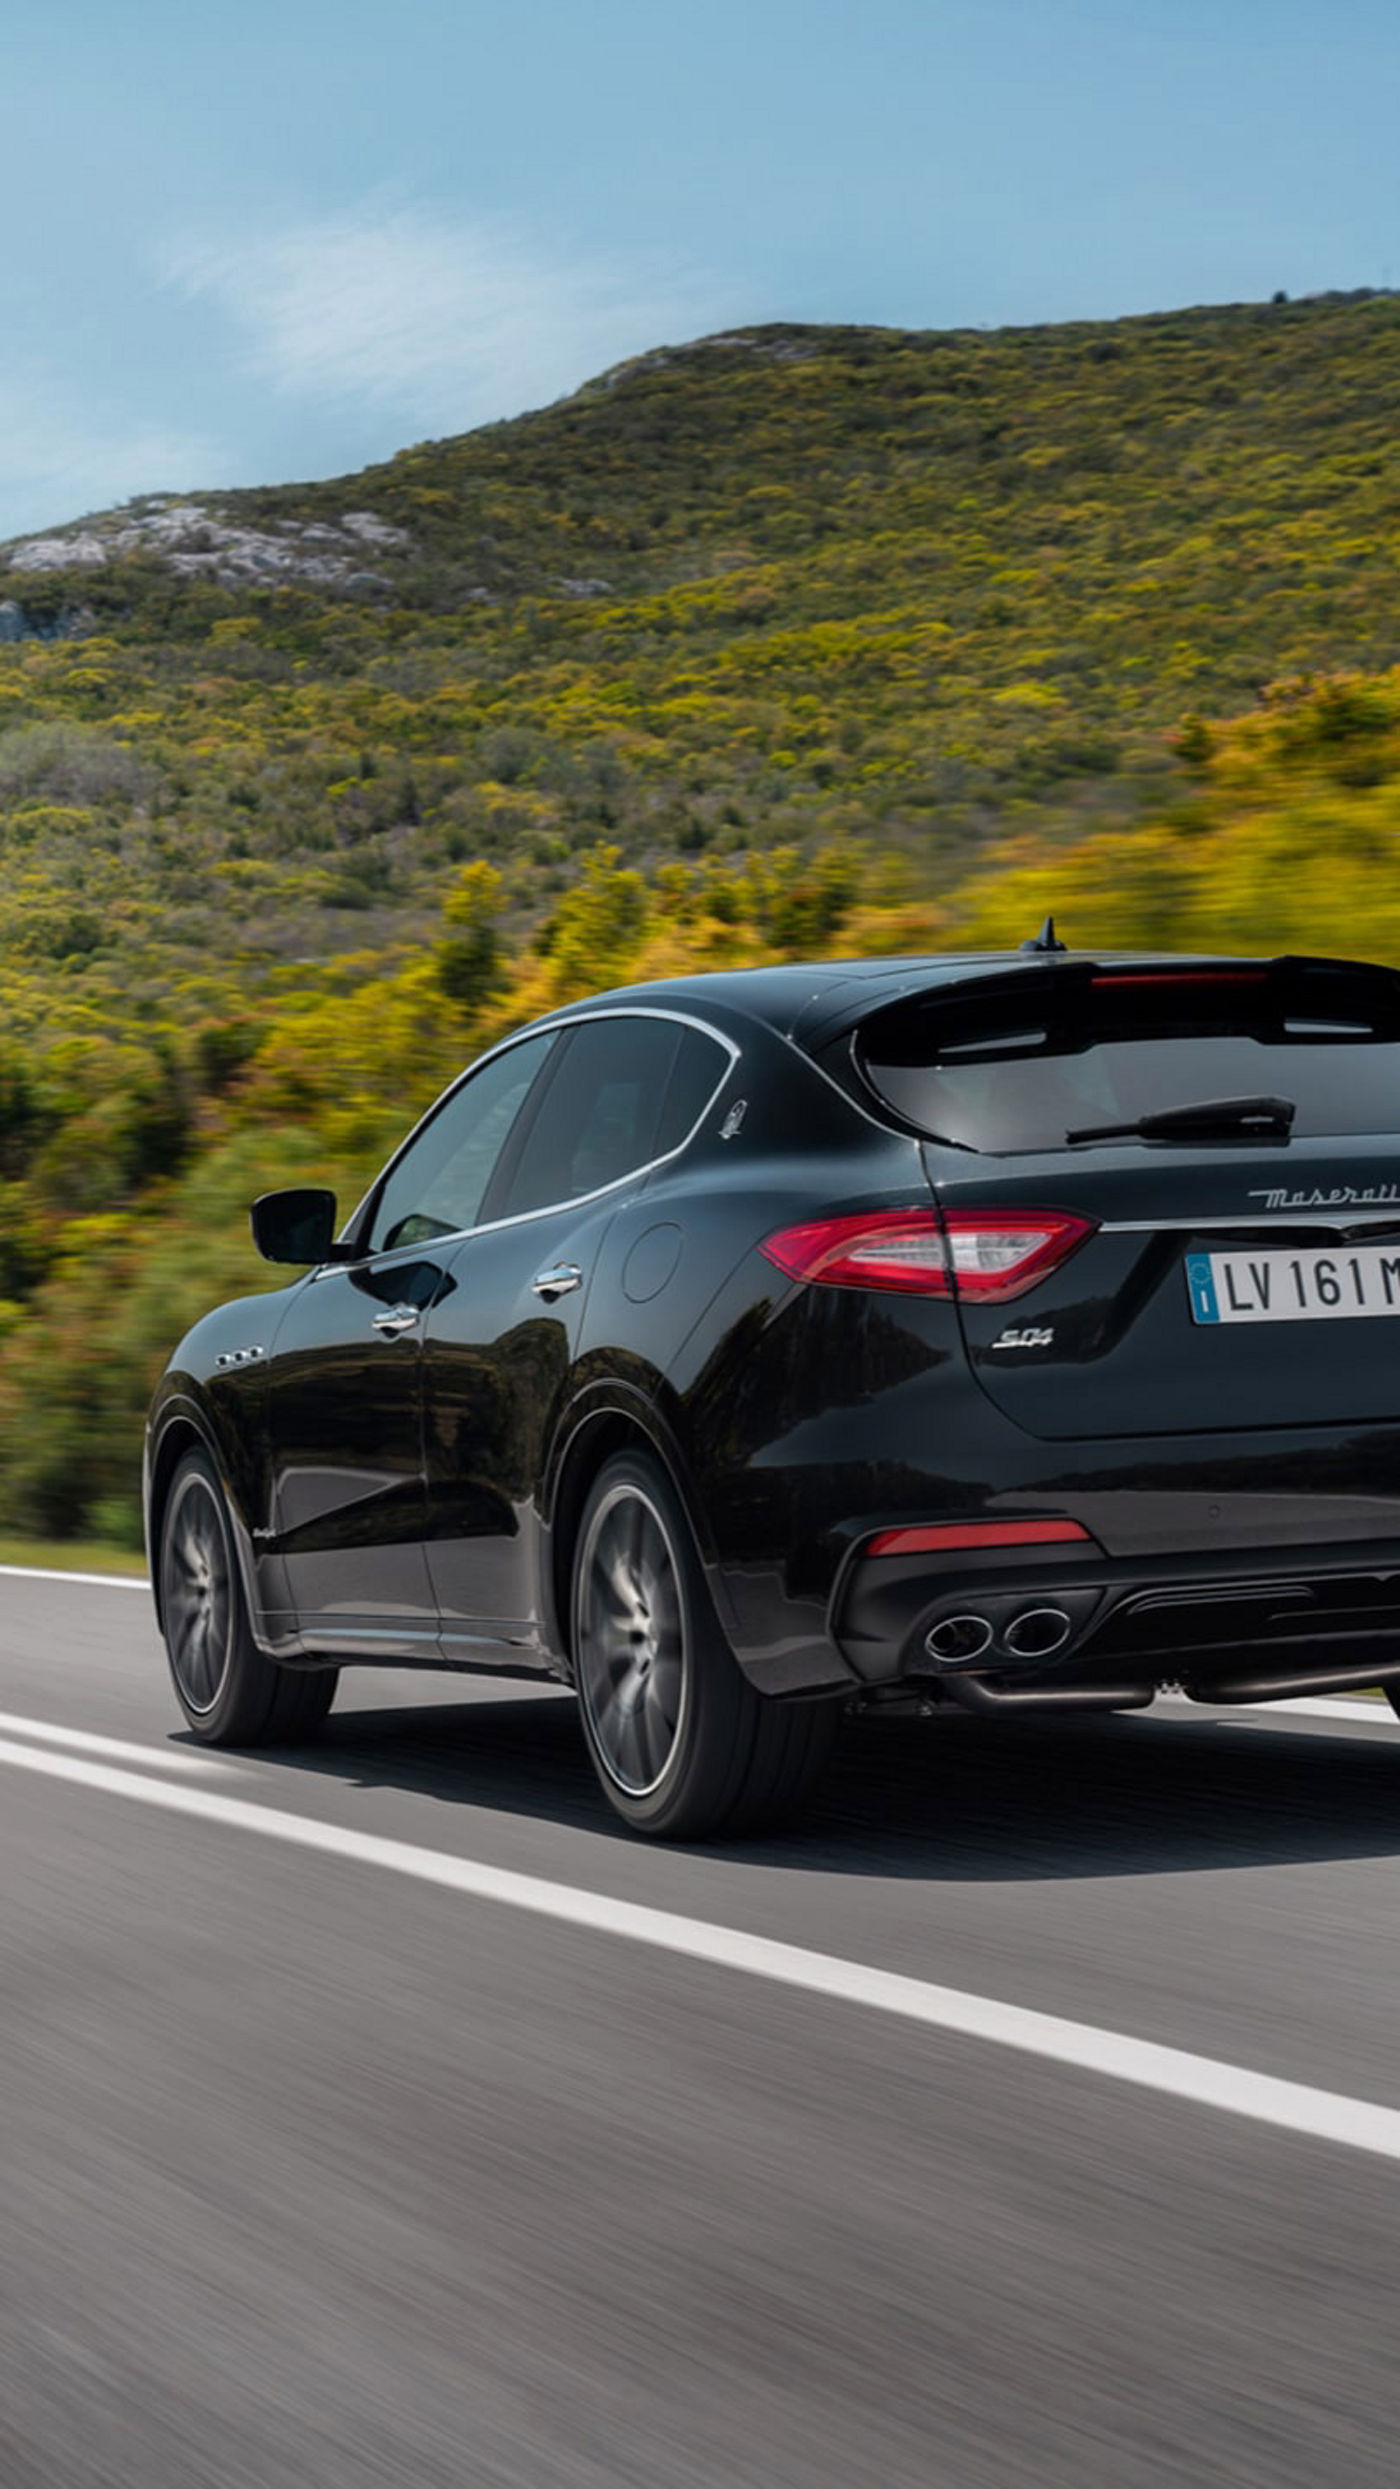 Maserati Levante S - rear view - on the road